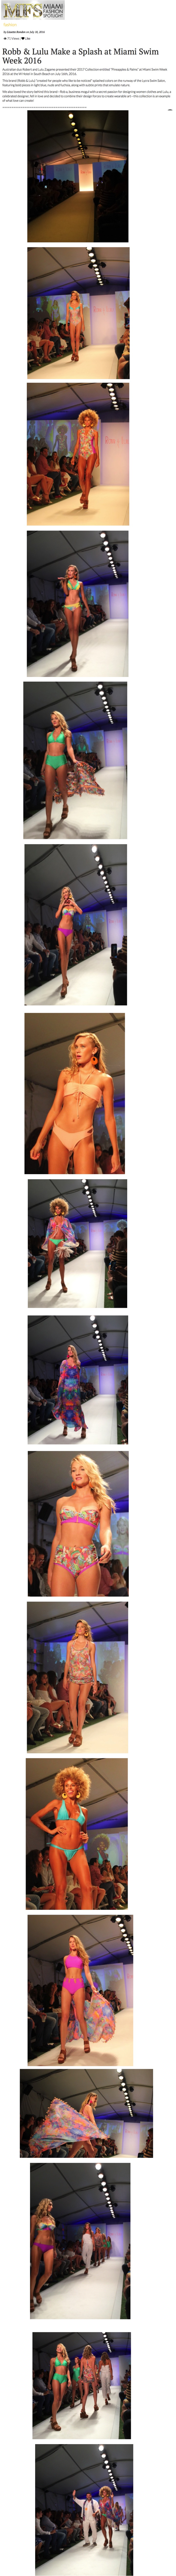 Miami Fashion Spotlight July 2016 Robb + Lulu.jpg